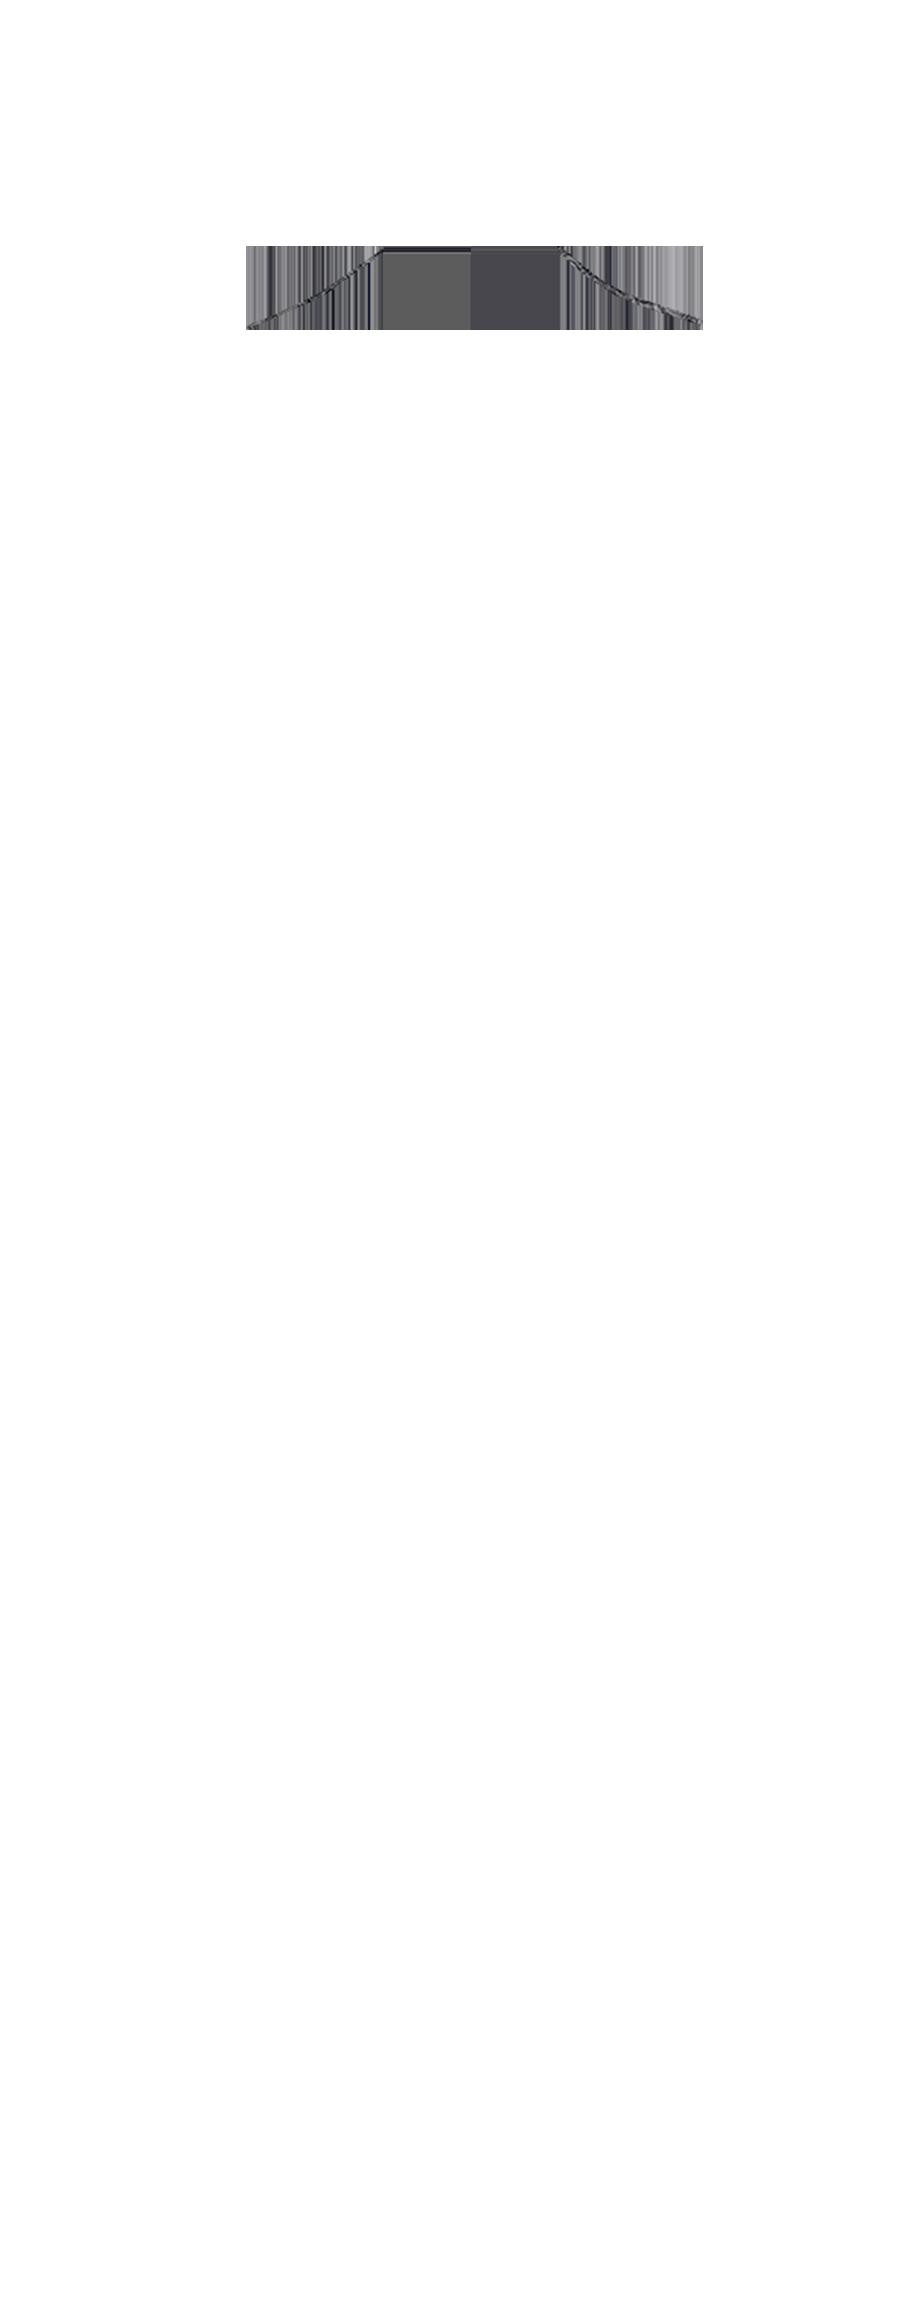 NEFL-23